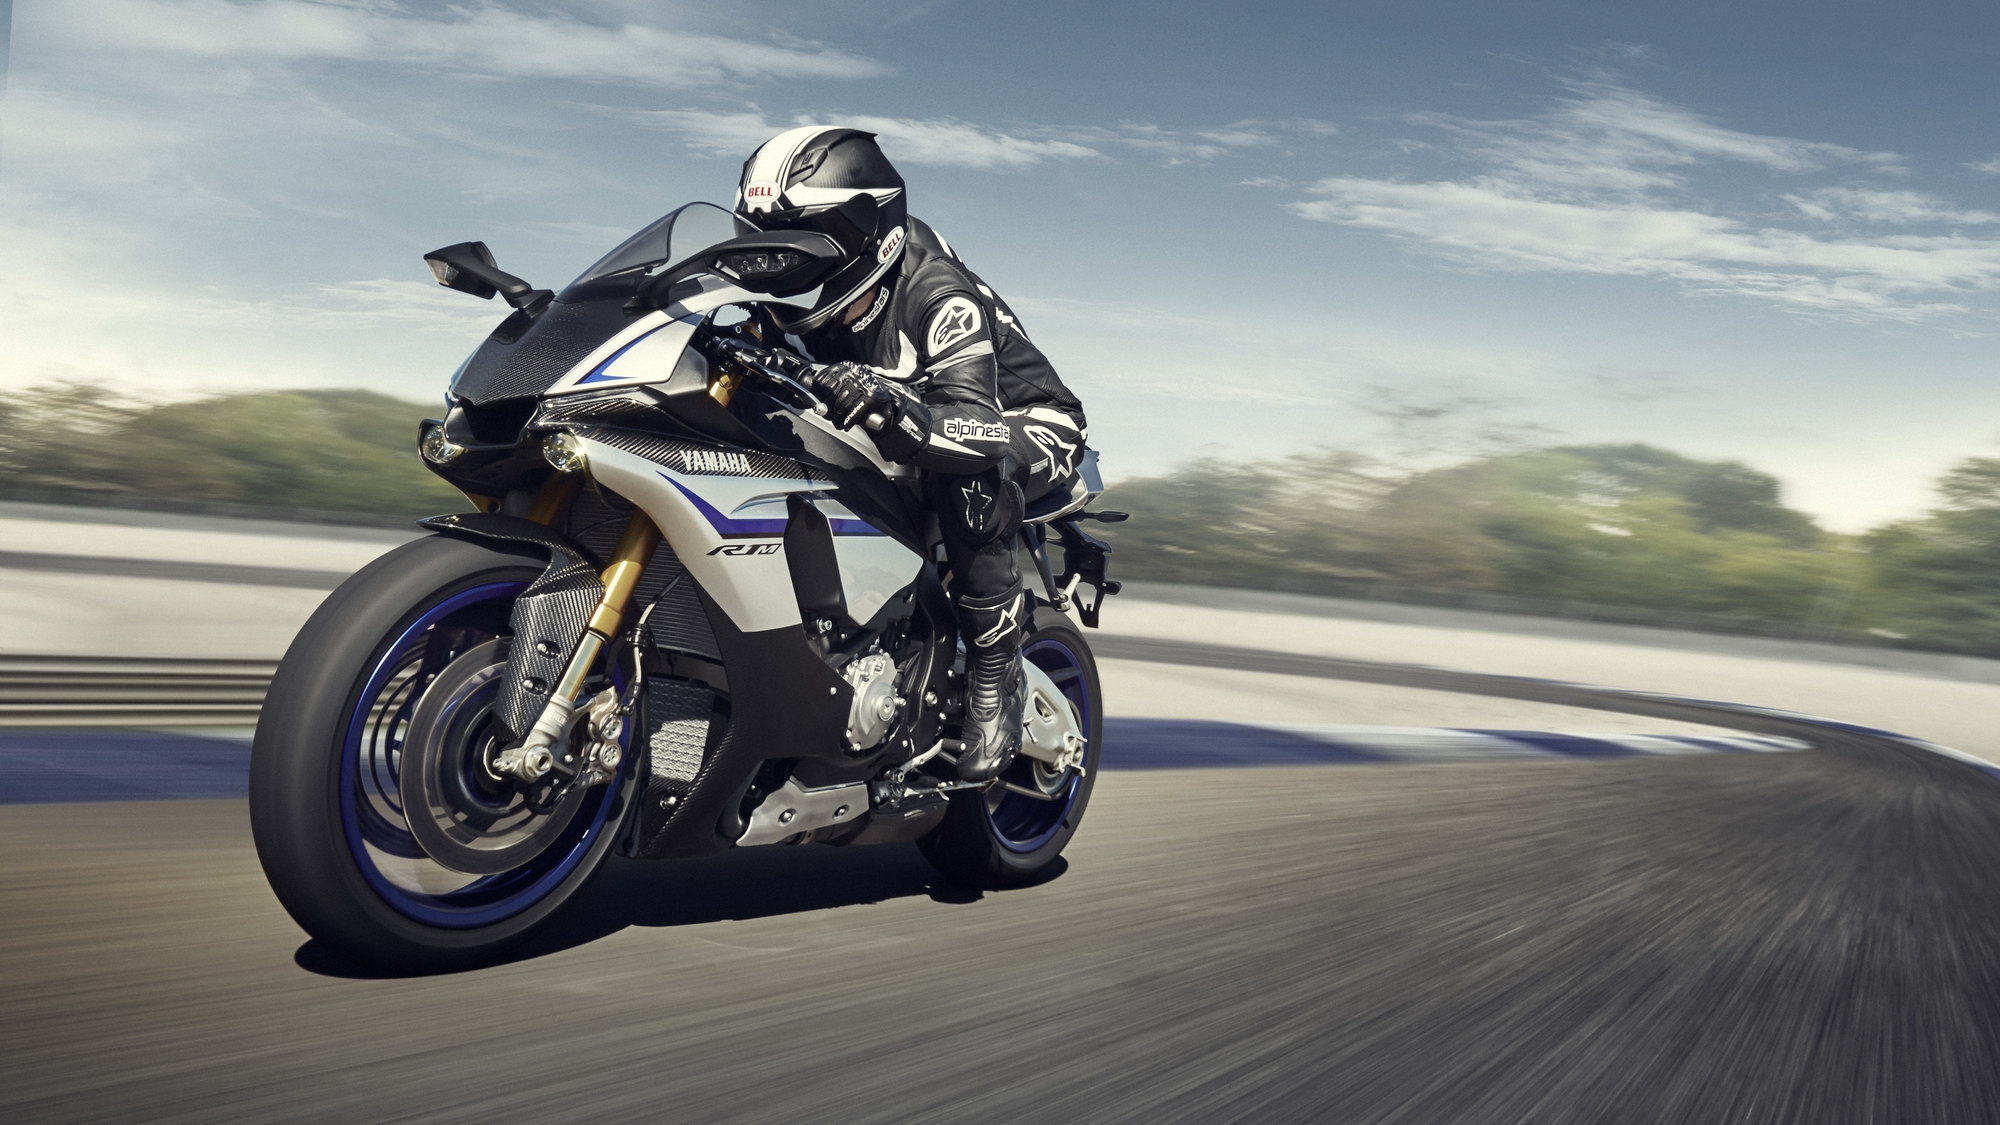 2015 Yamaha YZF-R1M US Price Announced, Bigger Engine Rumor Squashed - autoevolution